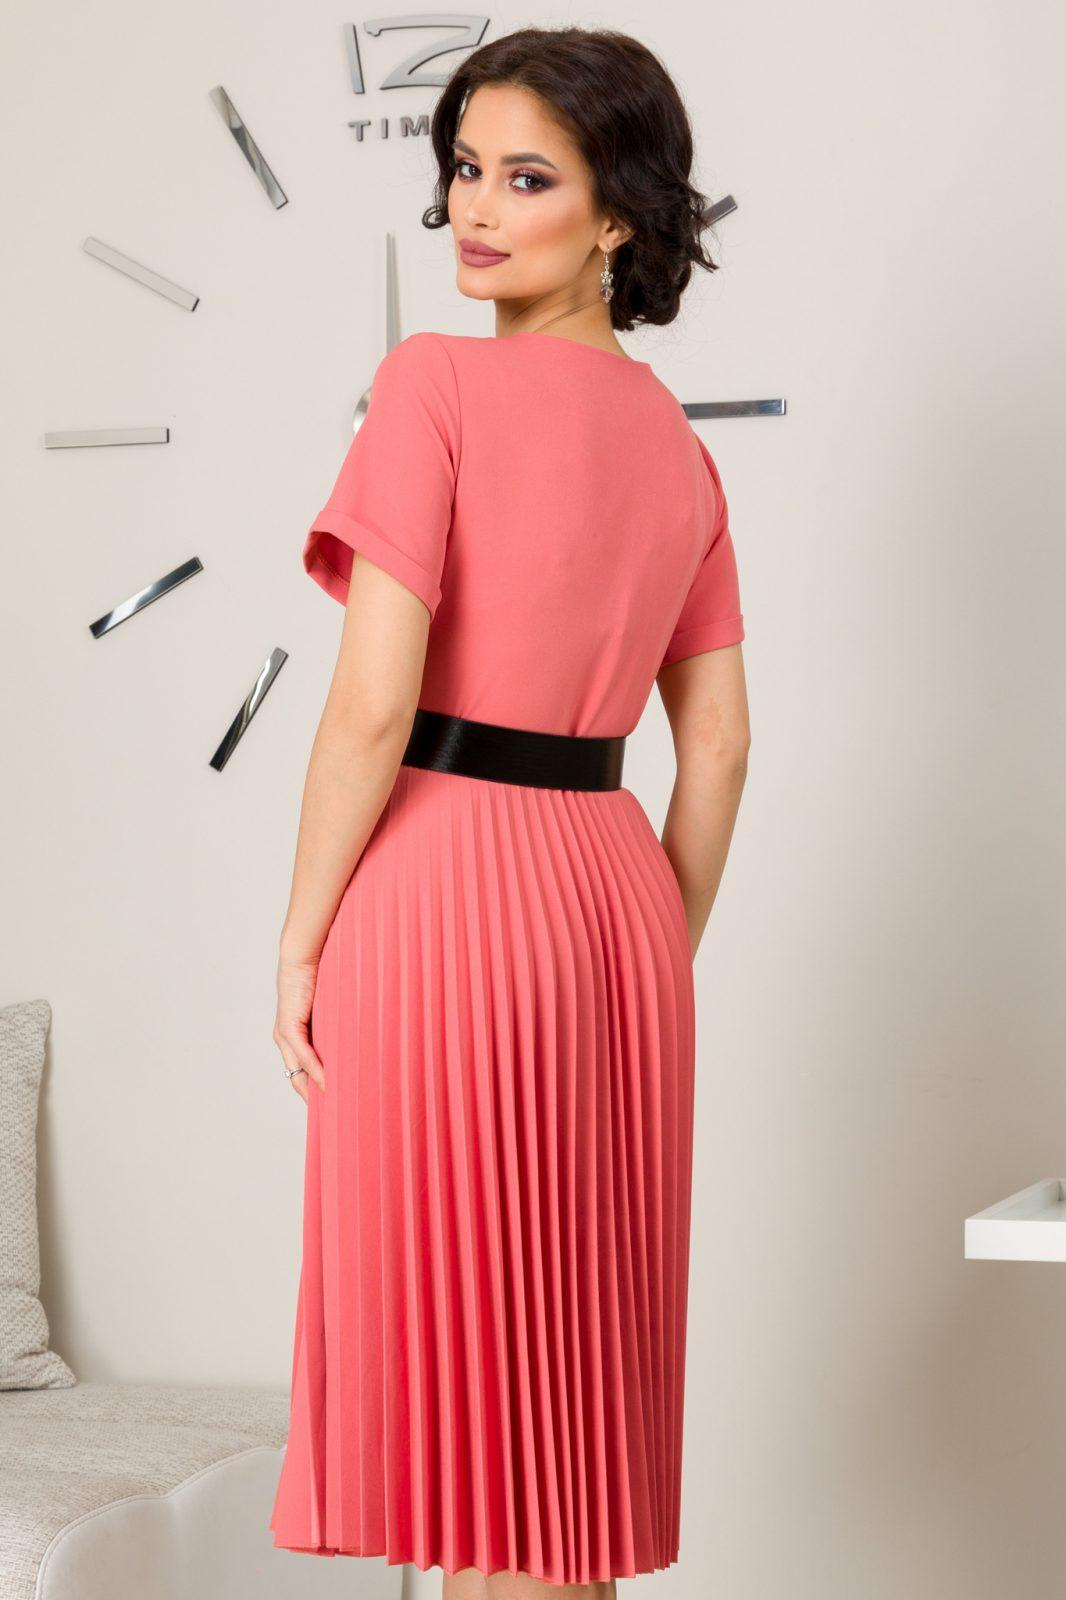 Jocelyn Ροδακινί Φόρεμα 7287